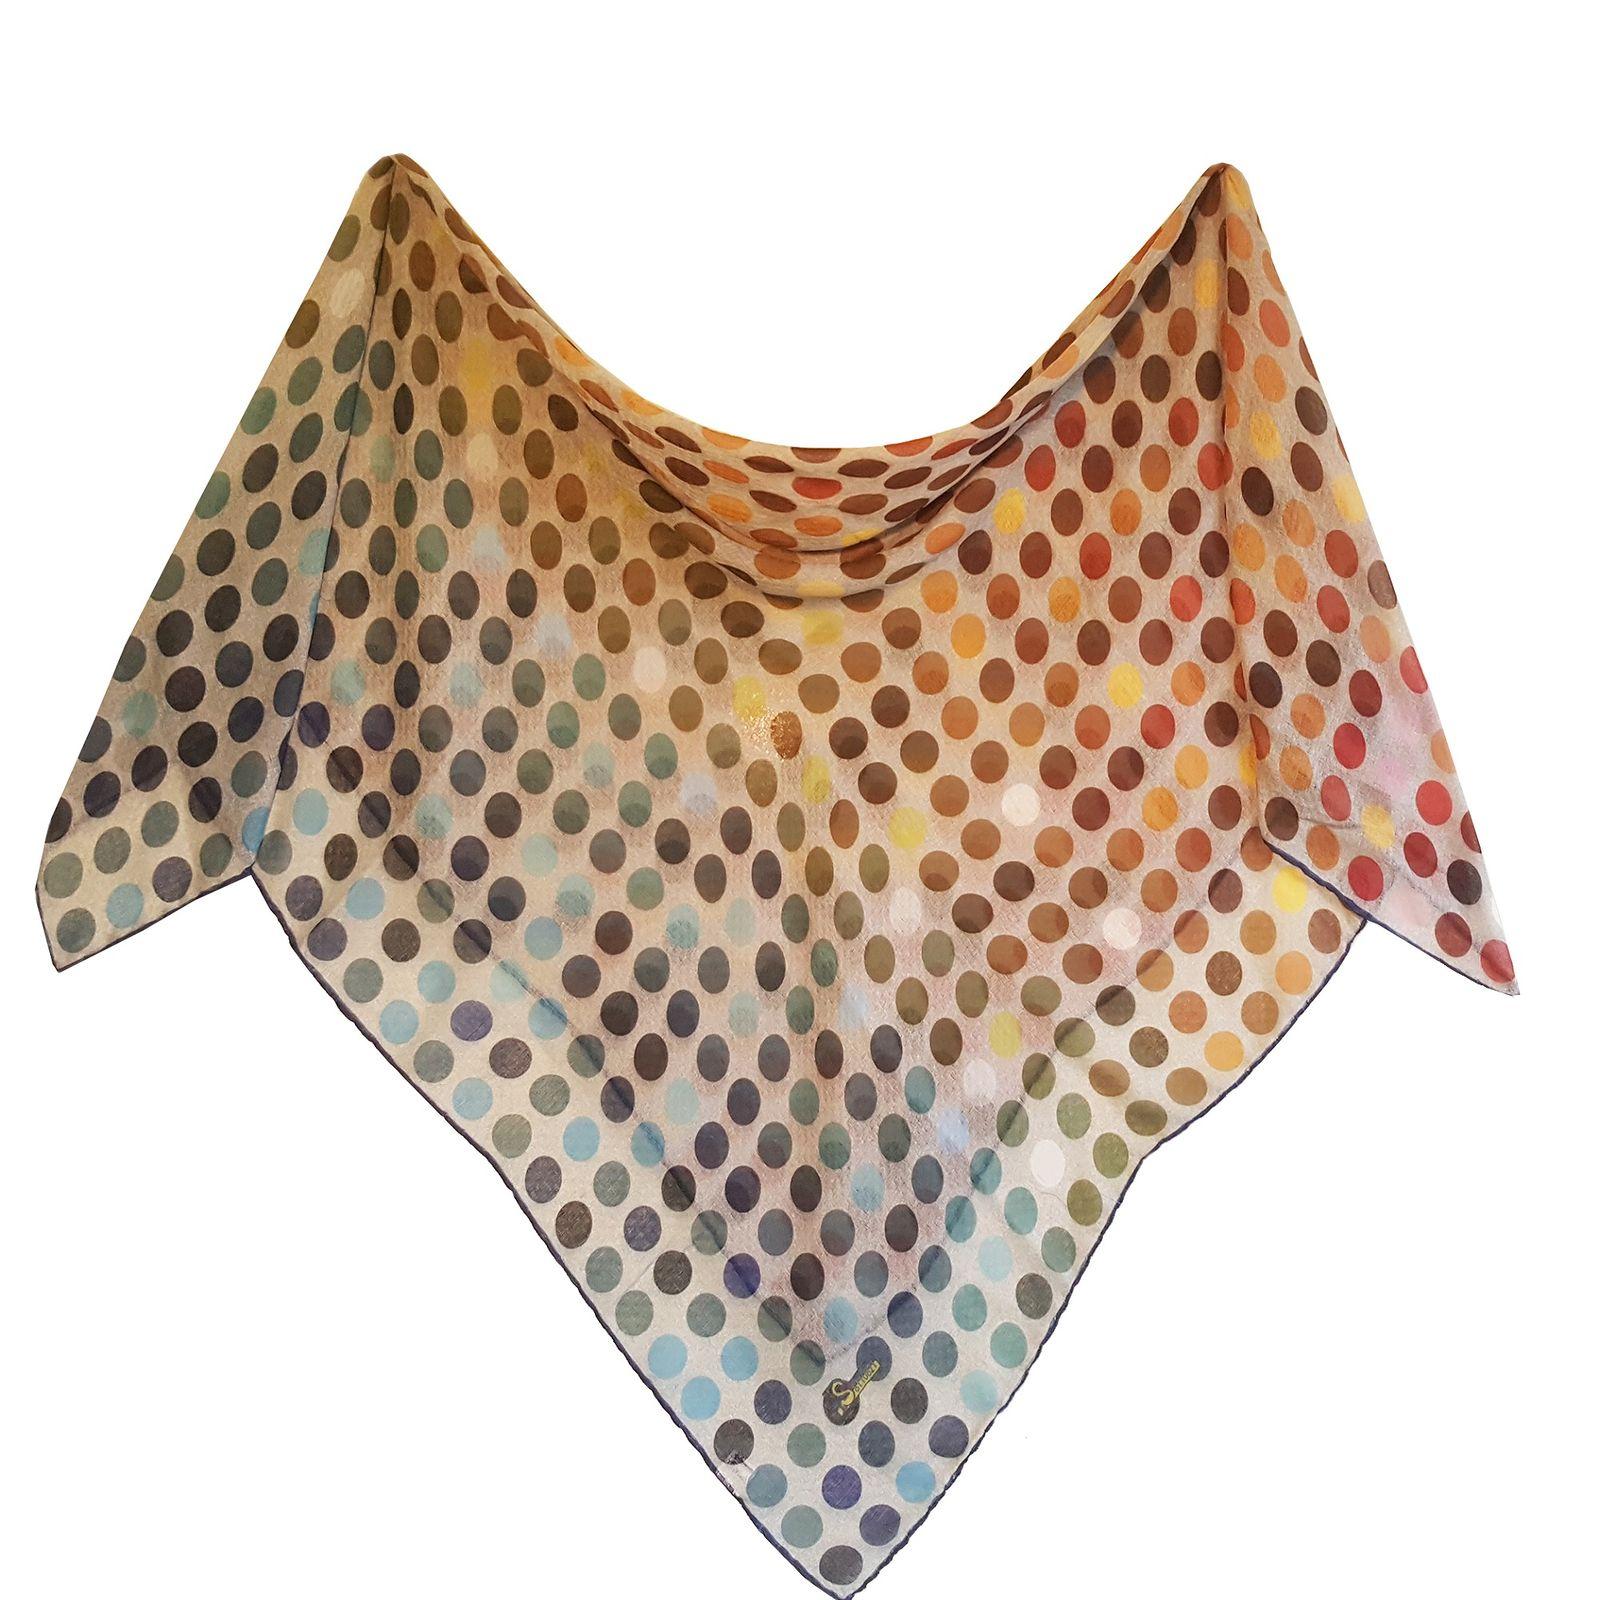 روسری زنانه کد 8110821 -  - 3